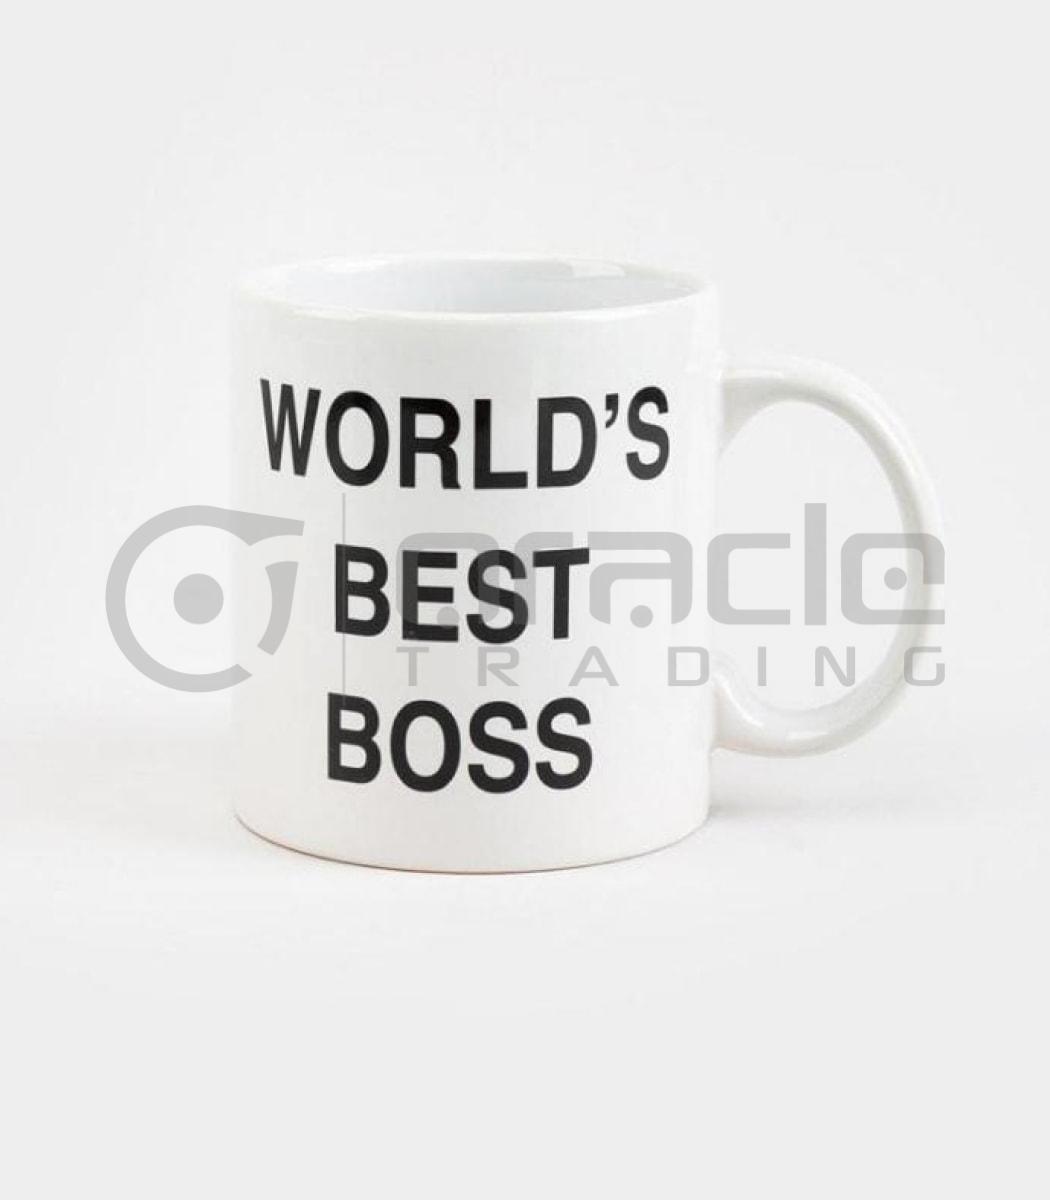 The Office Jumbo Mug - World's Best Boss